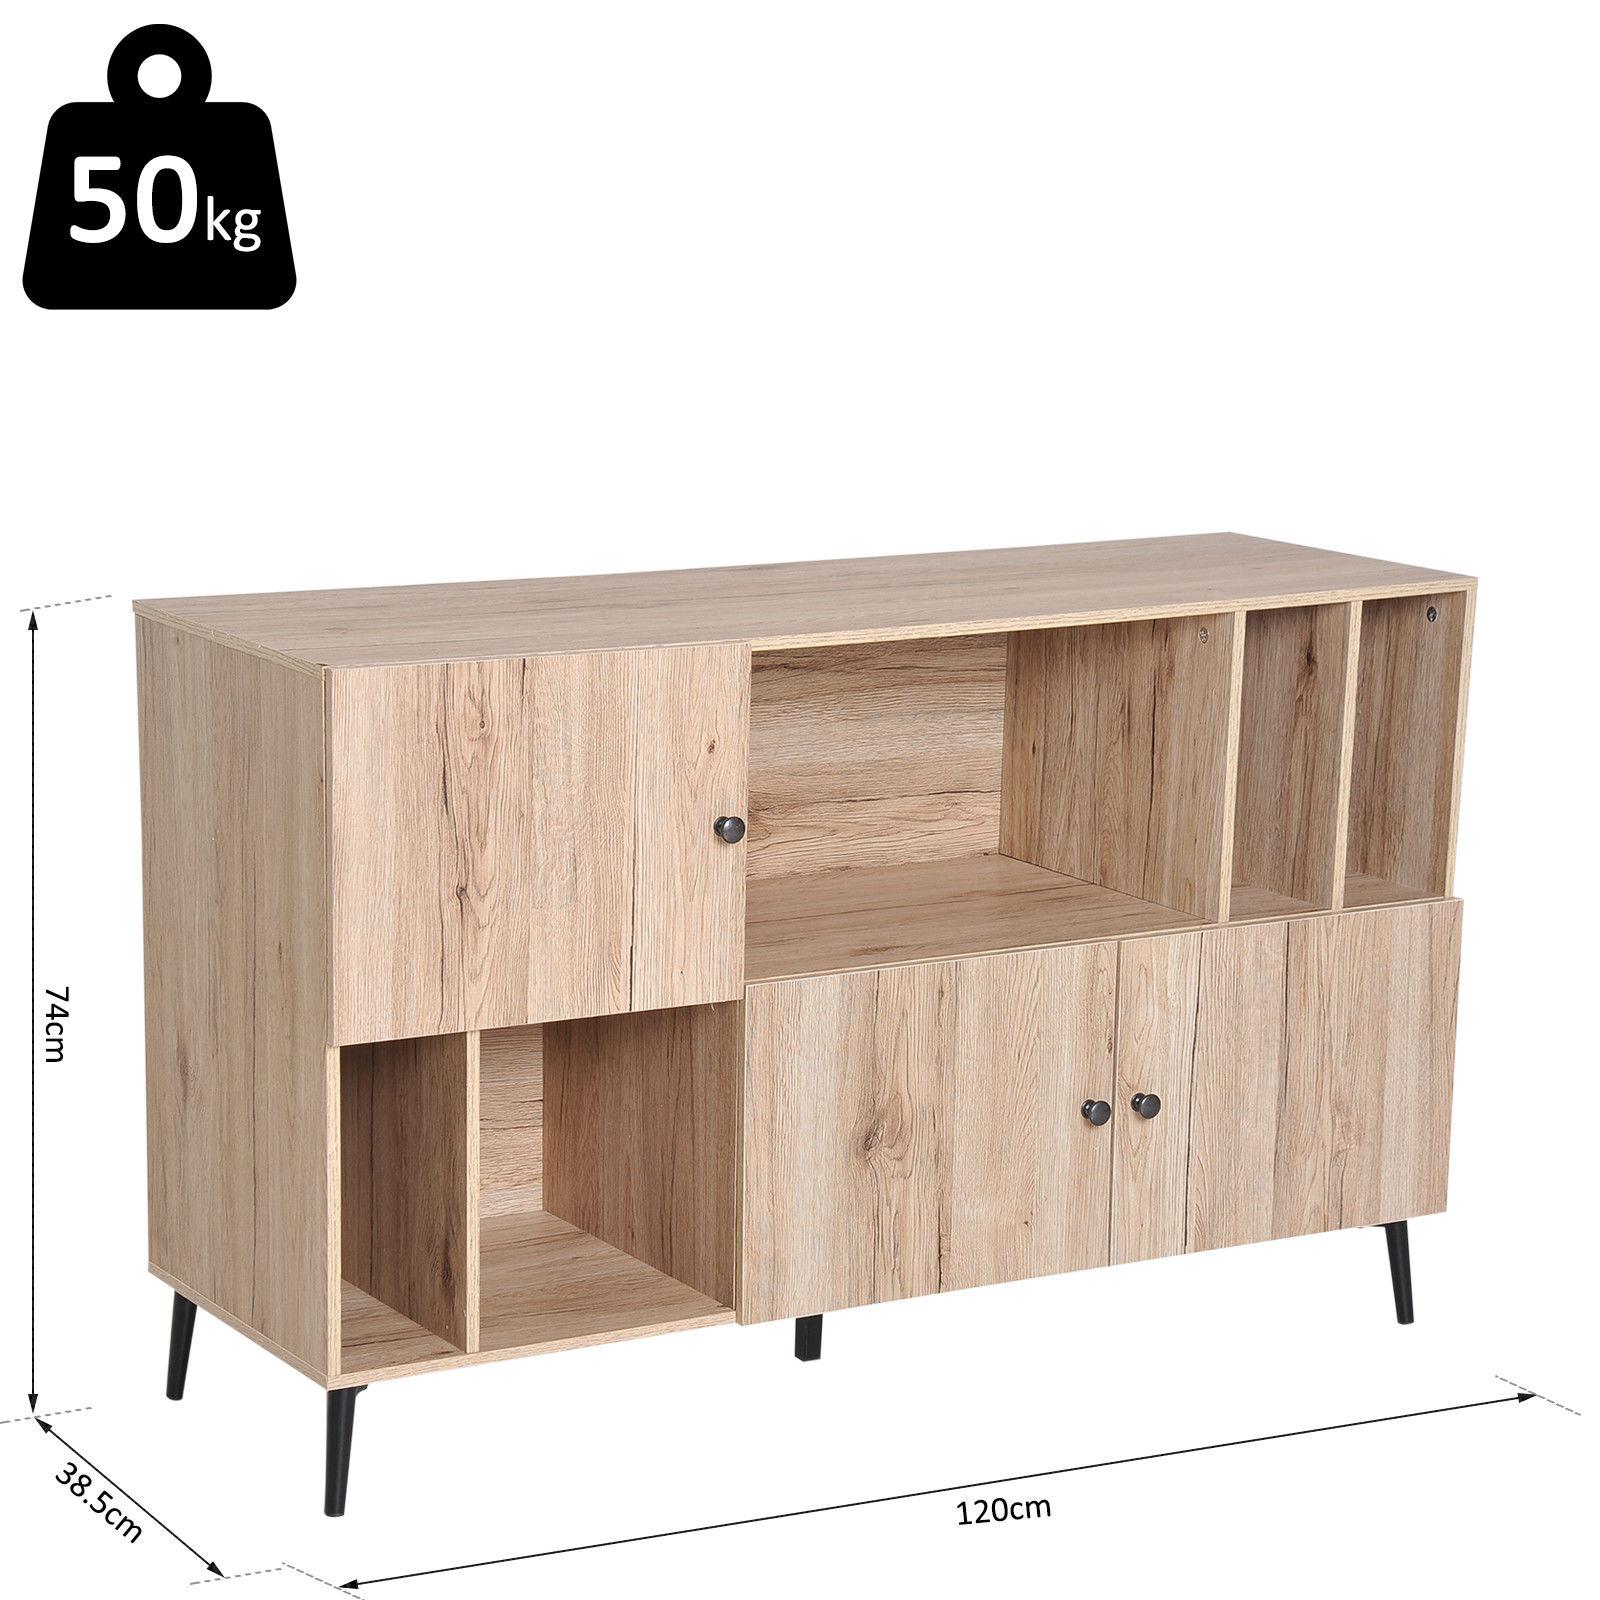 finest selection 3ec21 b0d0b Scandinavian Sideboard Cabinet Buffet Storage Metal Legs Oak | H4Home  Furnitures